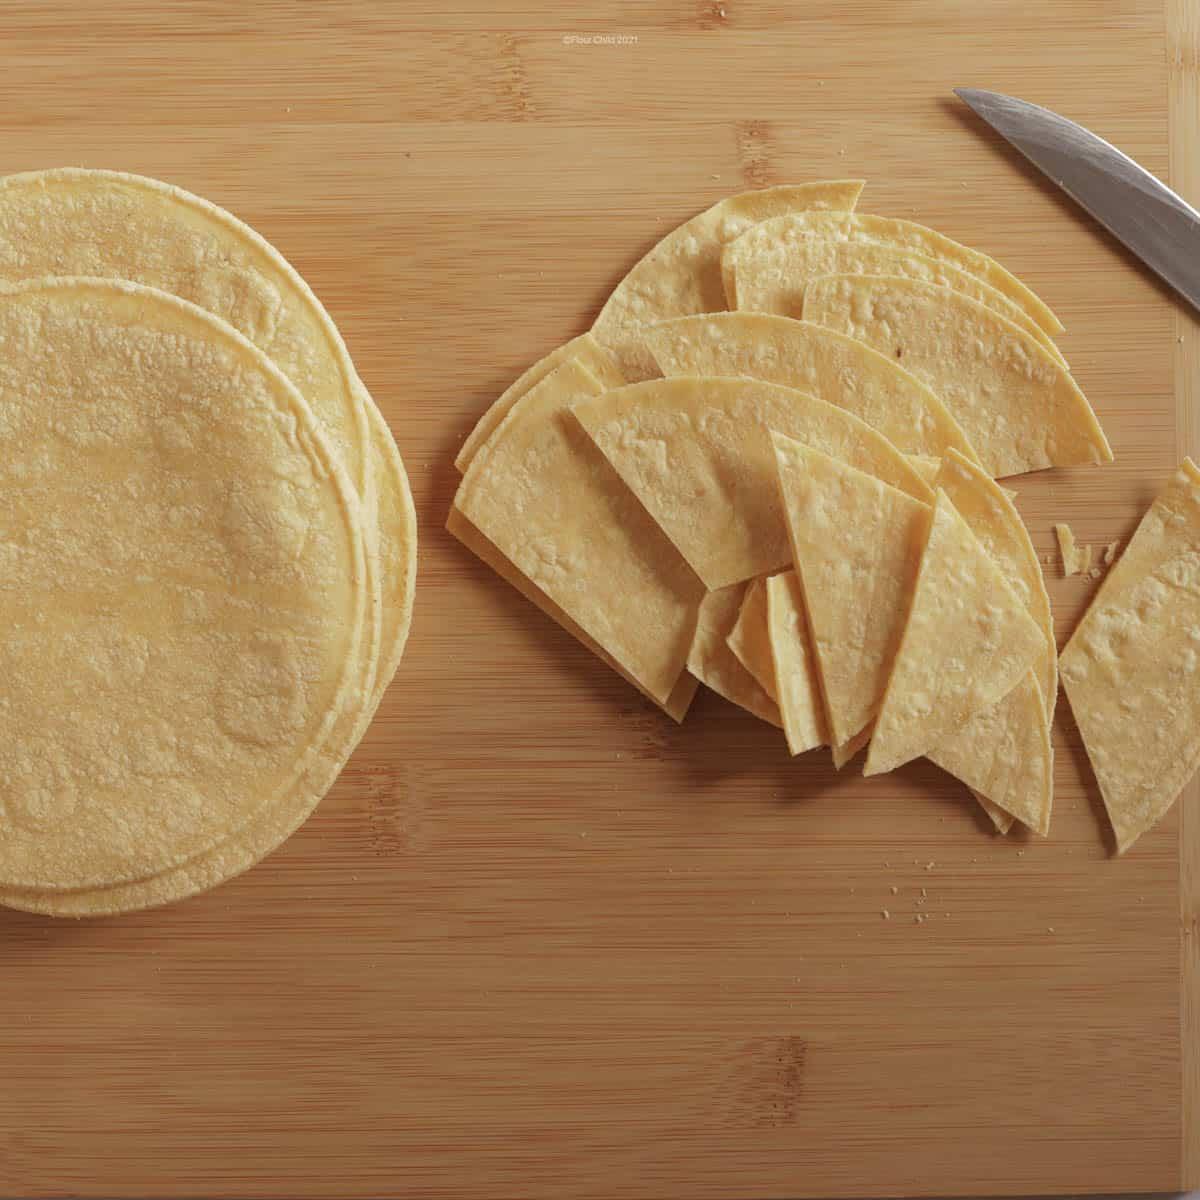 Corn tortillas cut into chip size